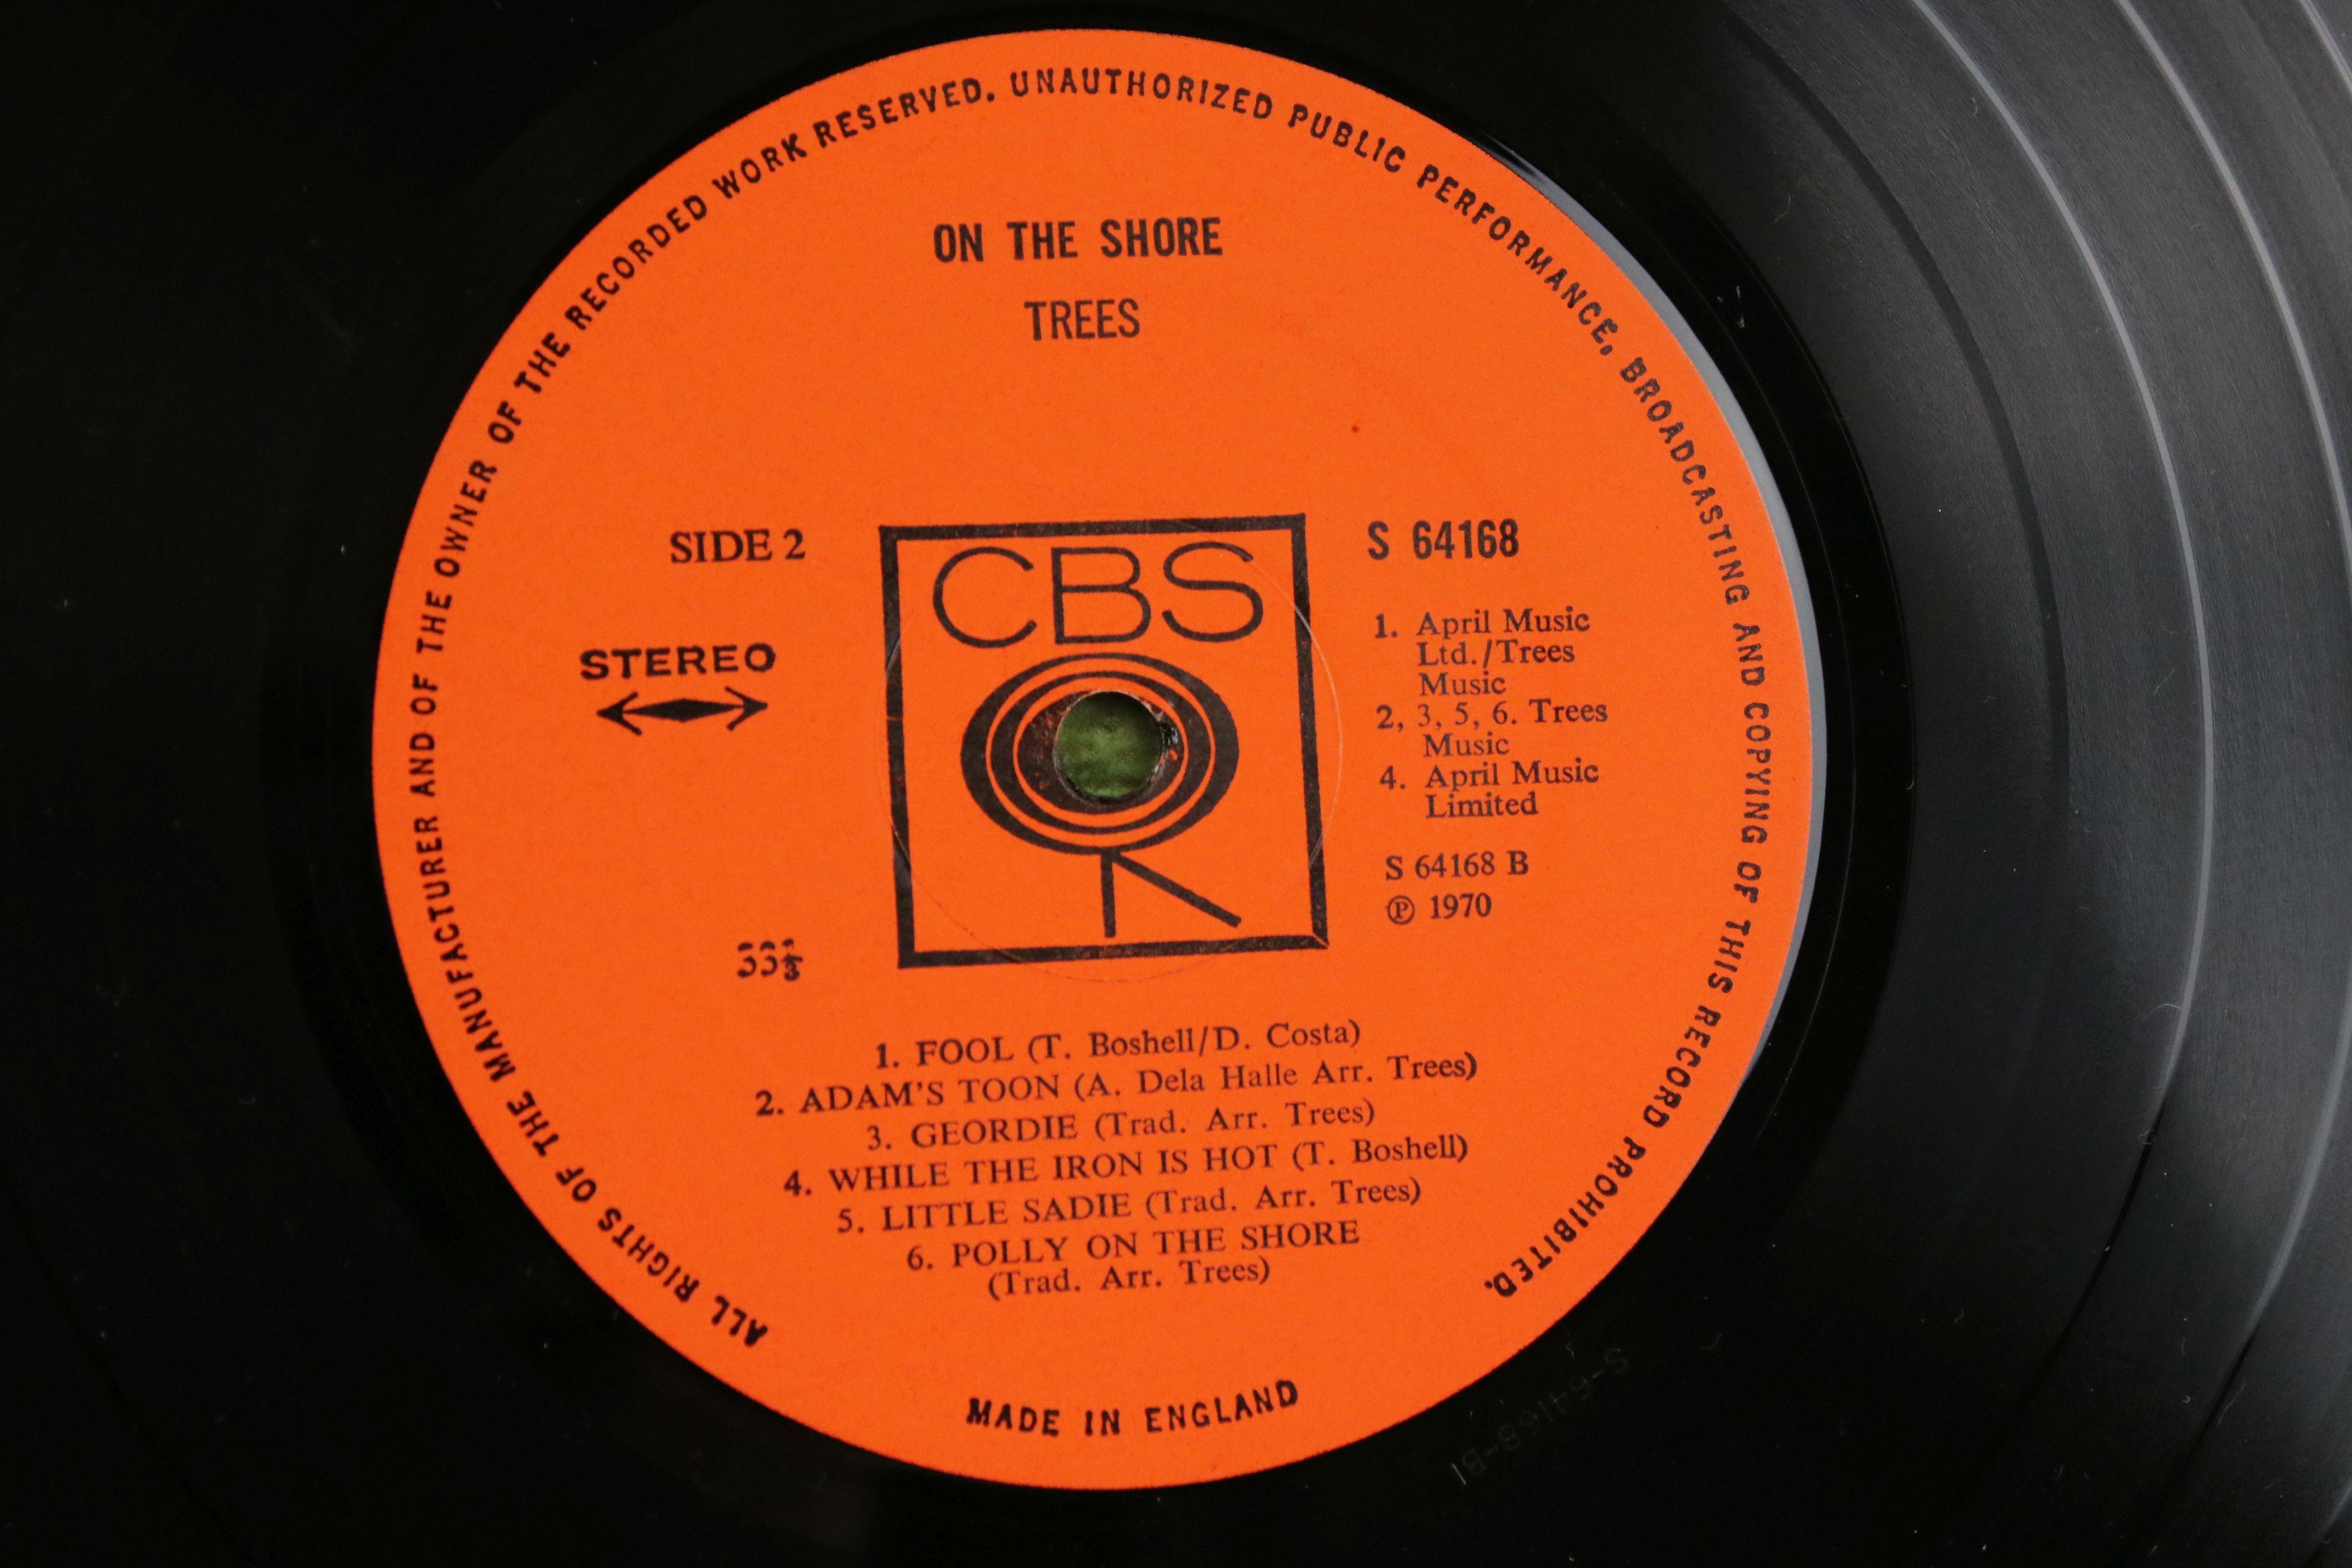 Vinyl - Trees On The Shore LP on CBS 64168 Stereo, vg+ - Image 4 of 4